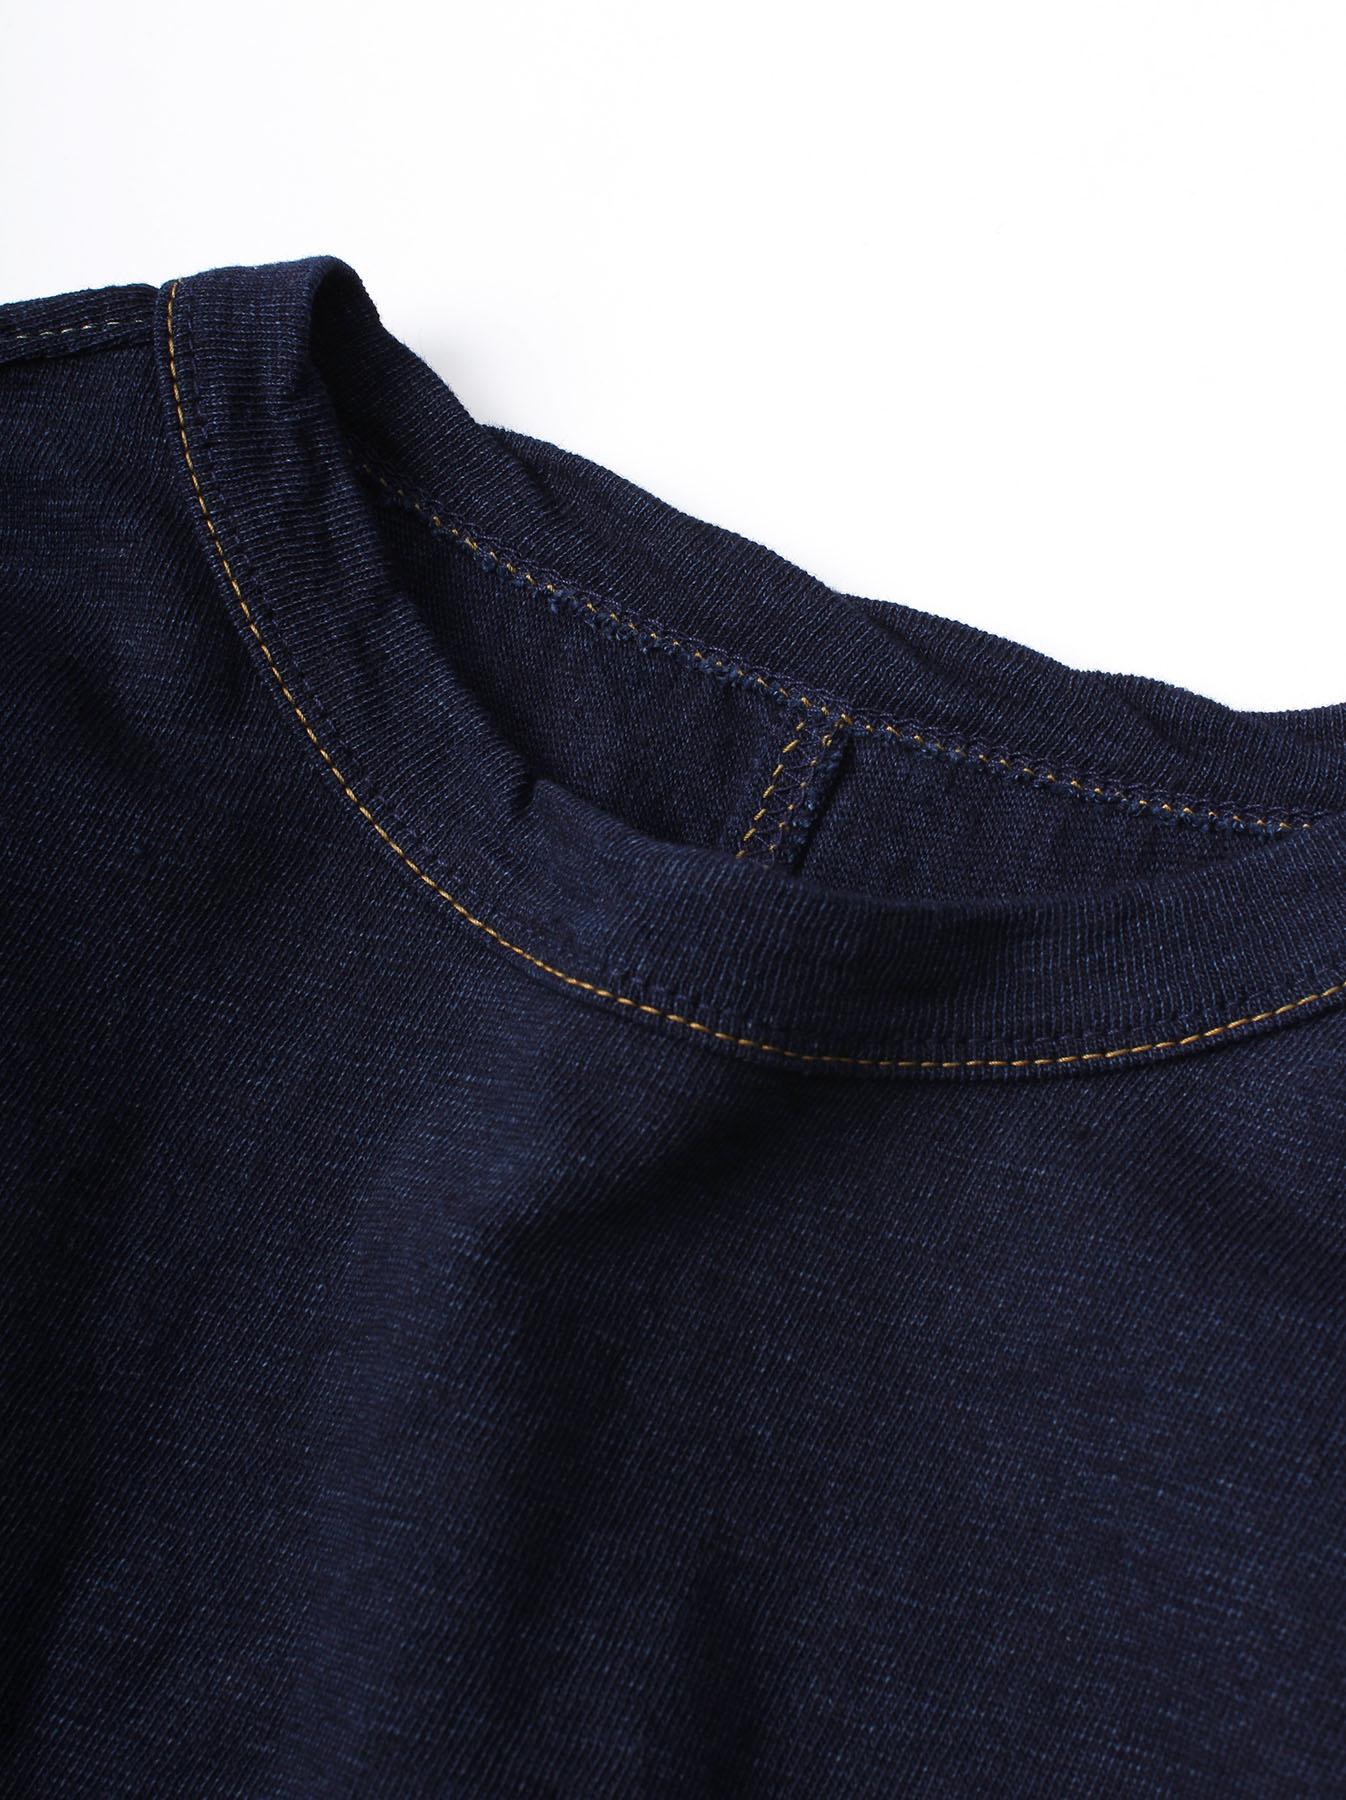 WH Indigo Plating Tenjiku T-shirt-2